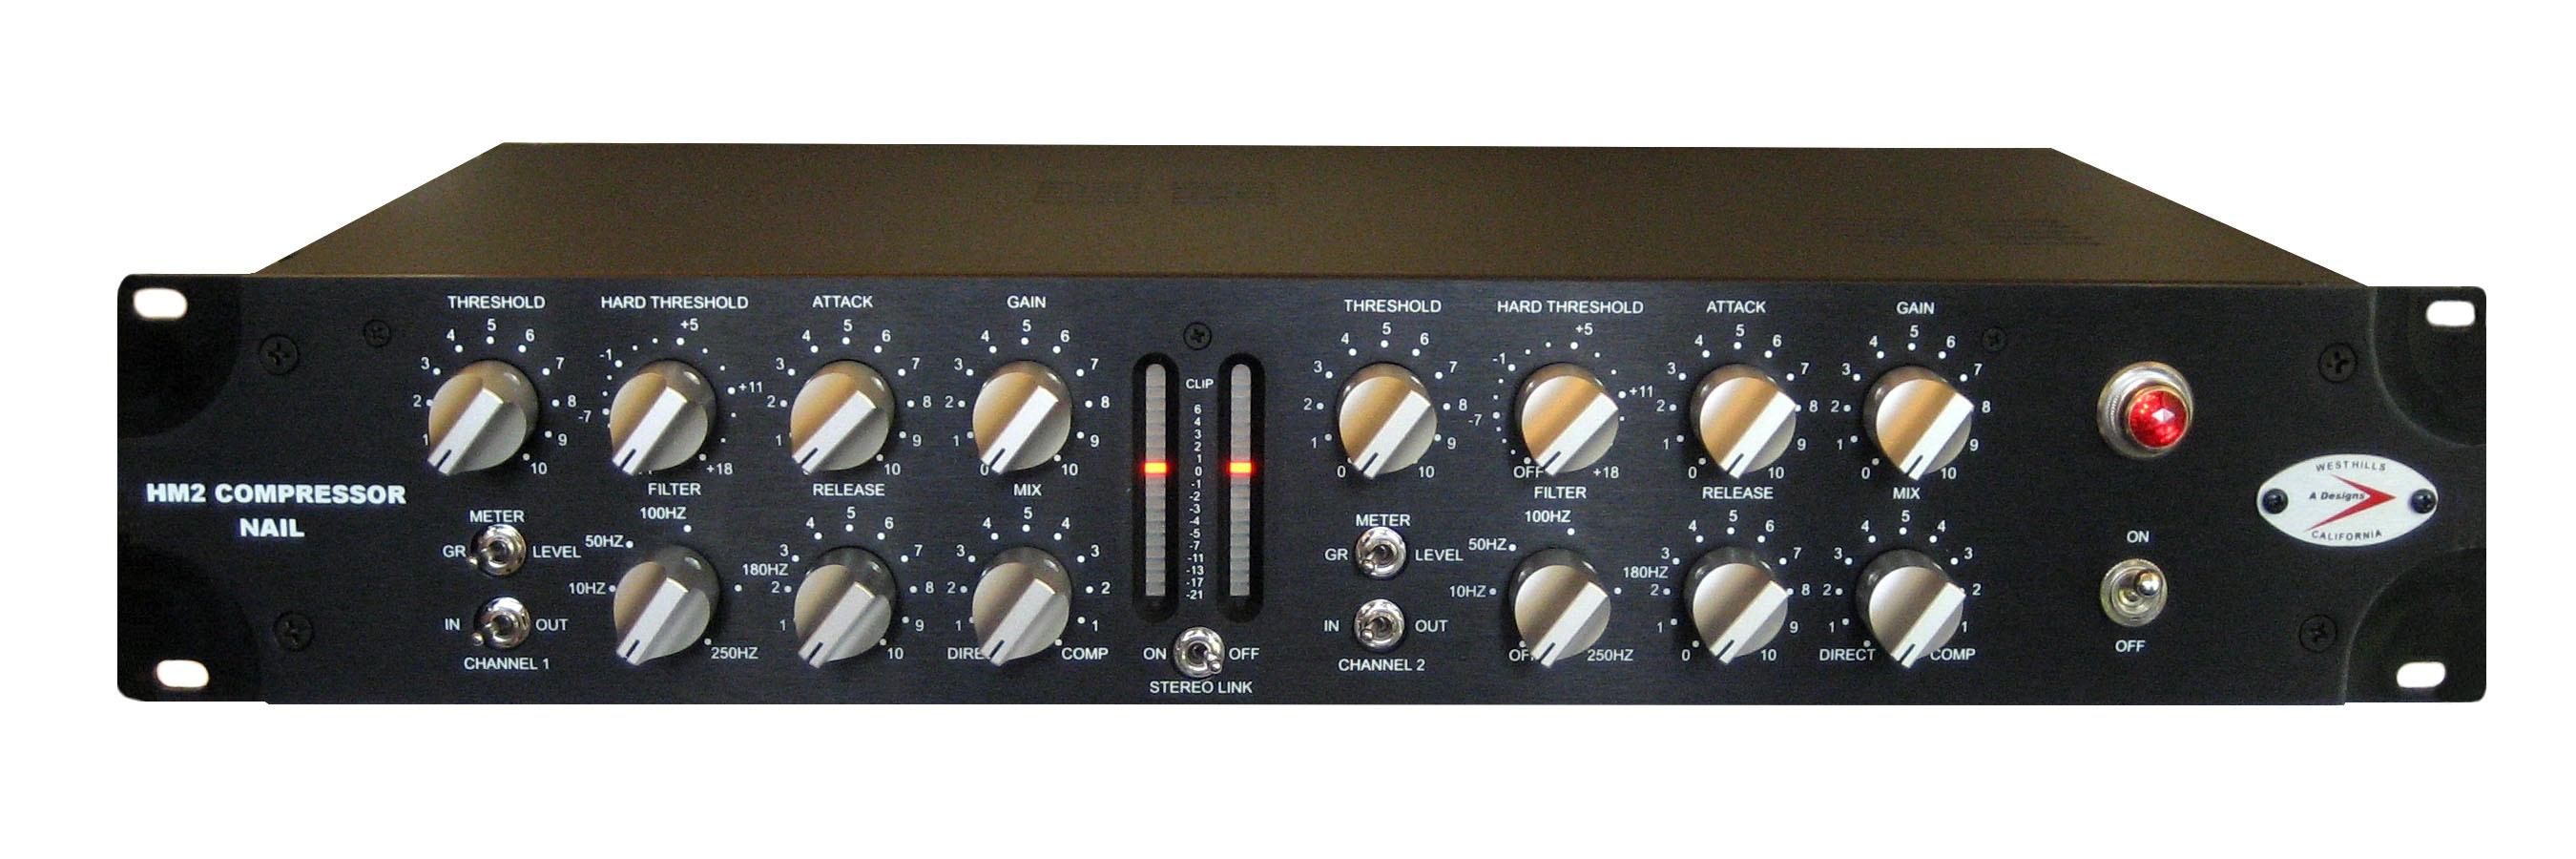 A designs audios nail a big hit gearslutz pro audio community a designs audios nail a big hit designsnailg prinsesfo Choice Image